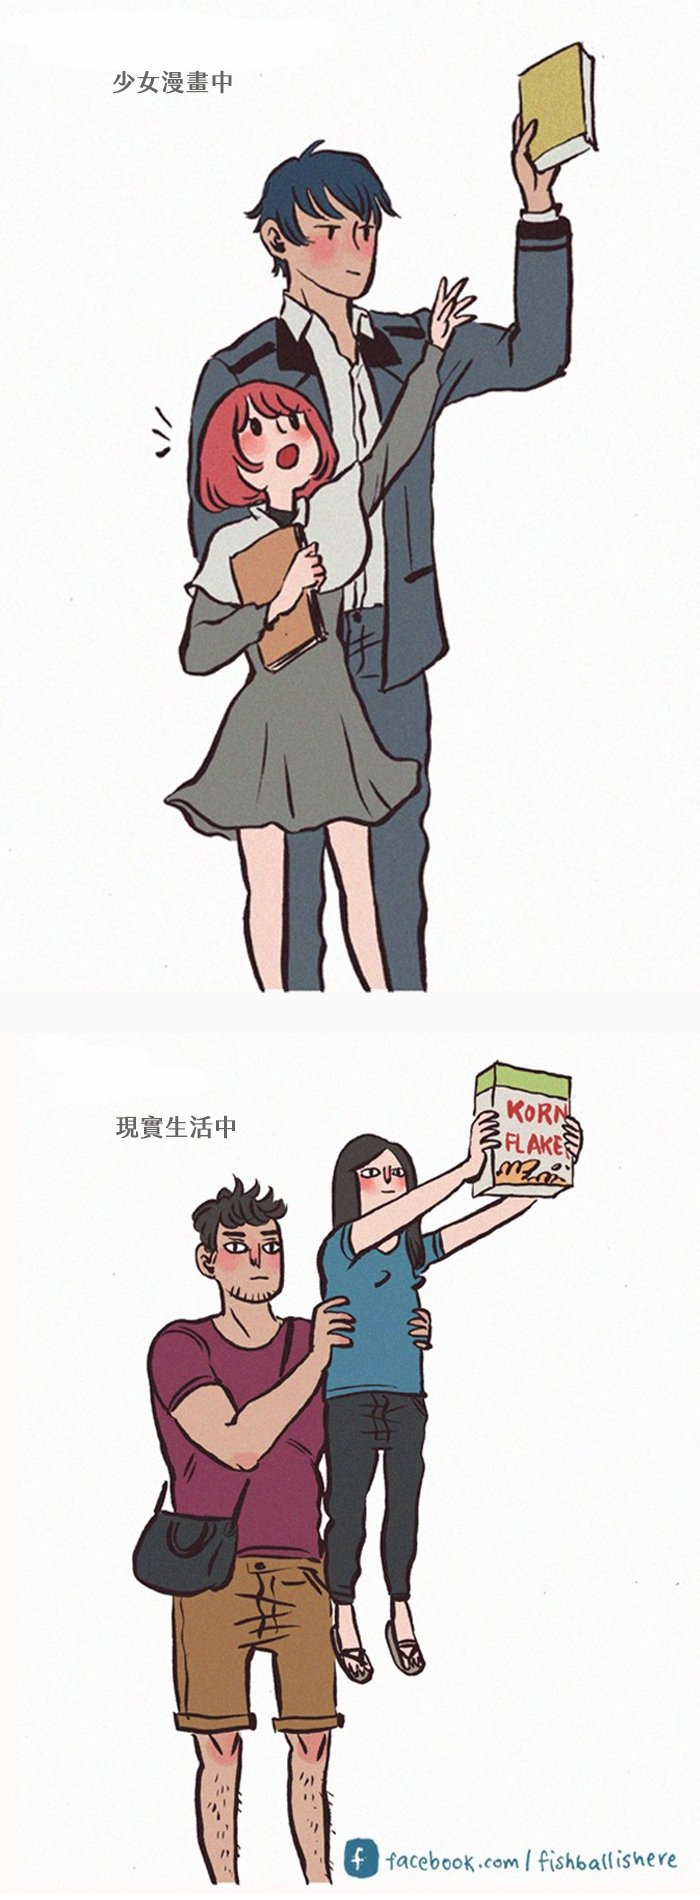 lovely-webtoons-when-you-love_my-giant-nerd-boyfriend-comics-fishball-25